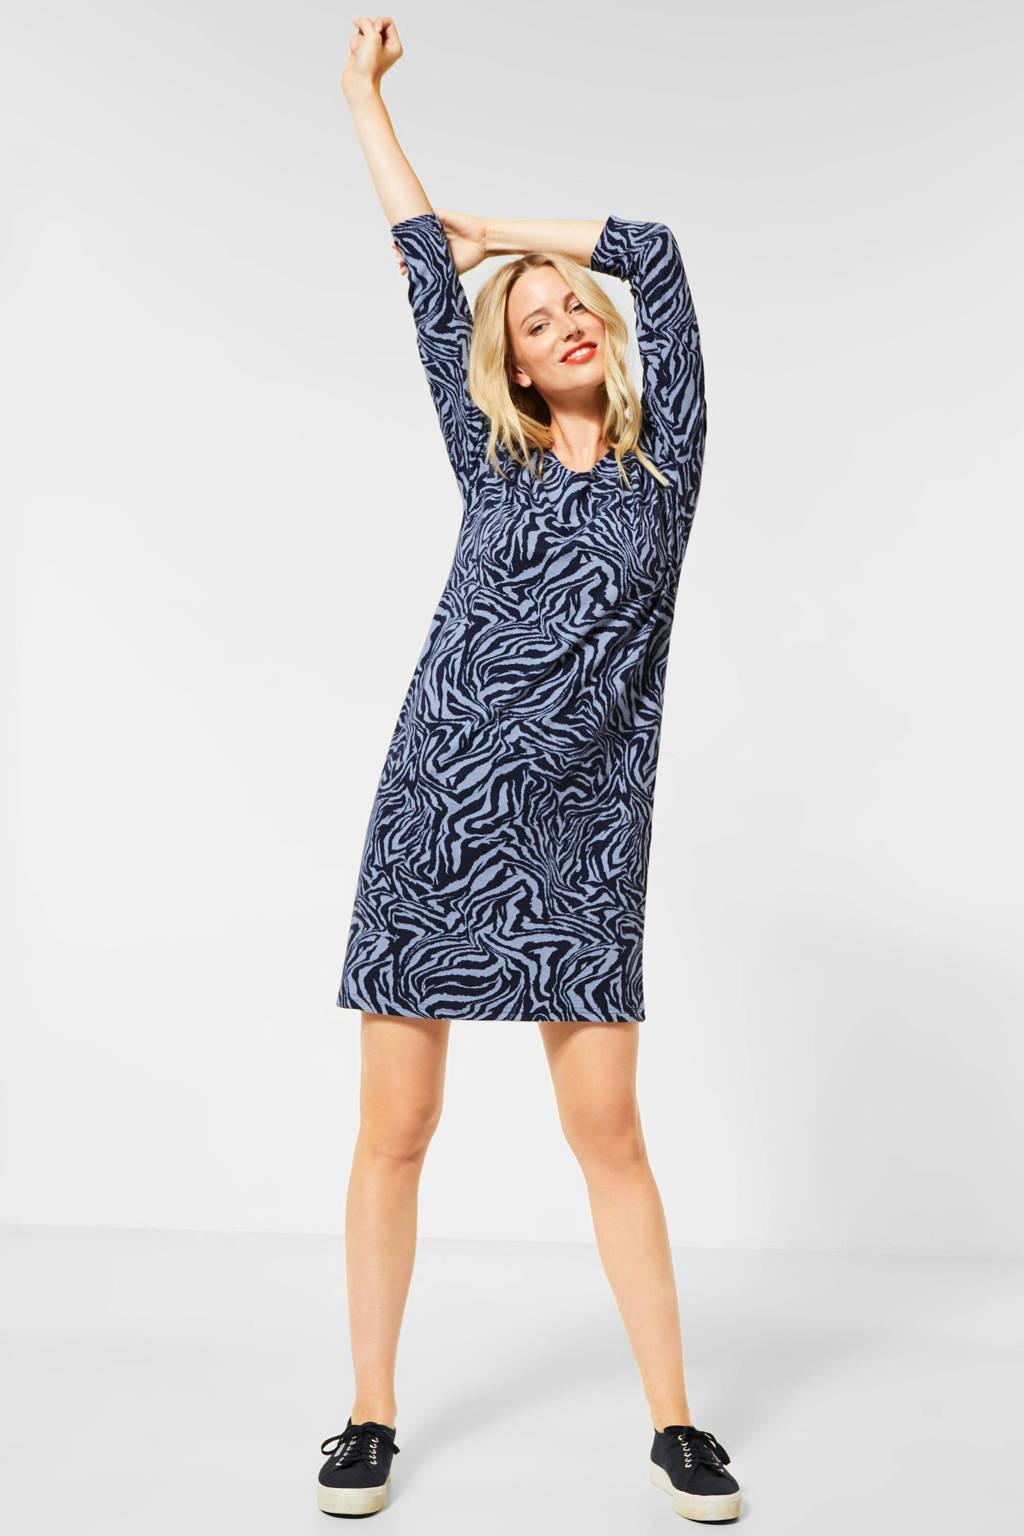 Street One gebreide jurk met zebraprint lichtblauw/donkerblauw, Lichtblauw/donkerblauw